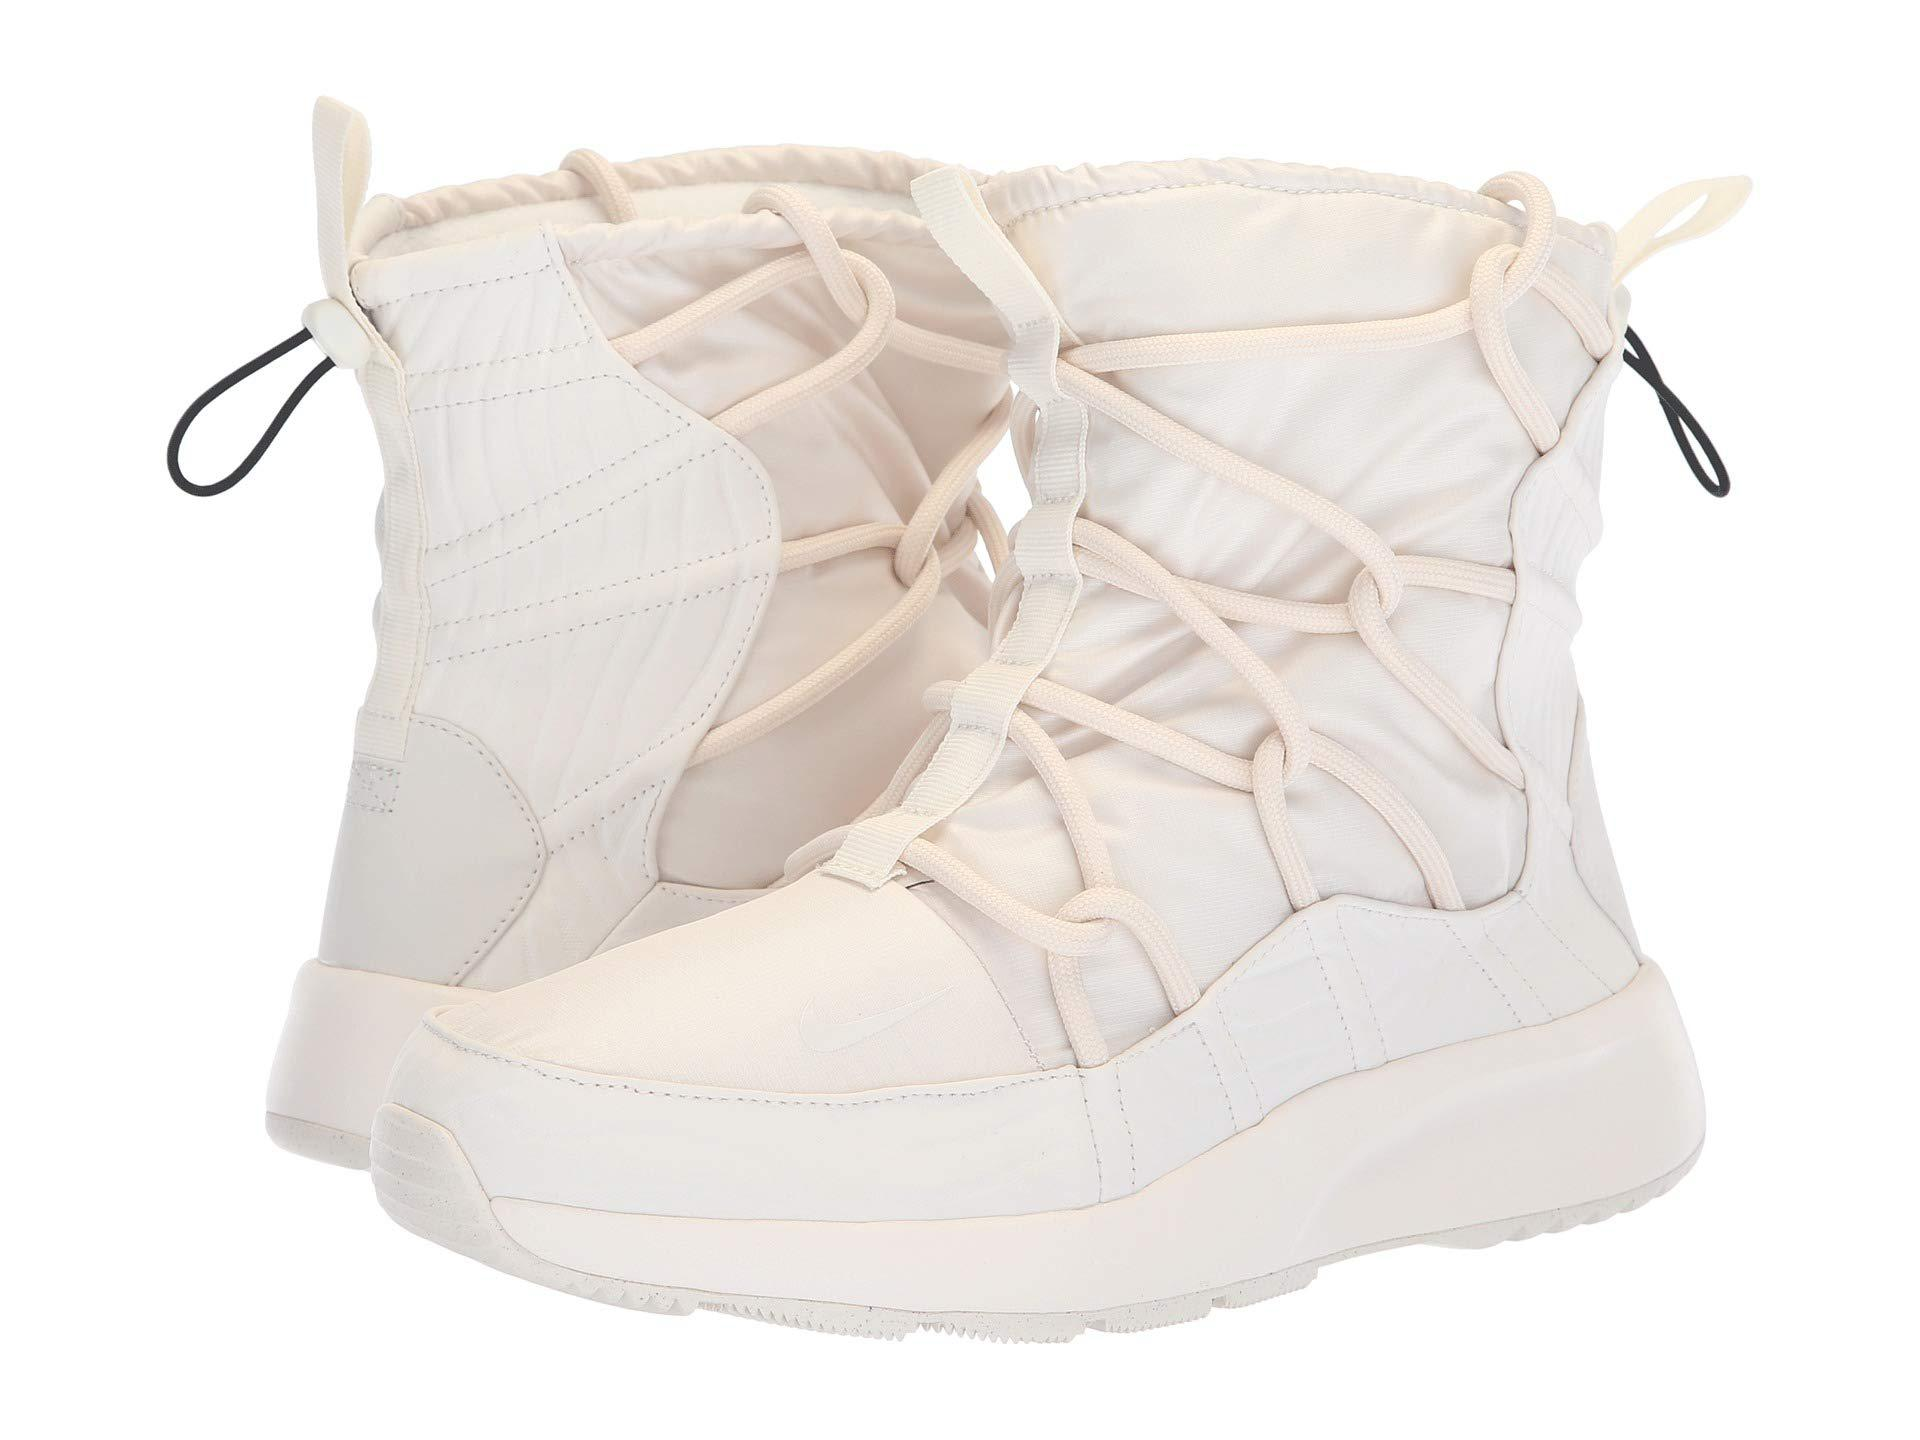 ec7f2ba67 Lyst - Nike Tanjun High-rise (phantom phantom black) Women s Shoes